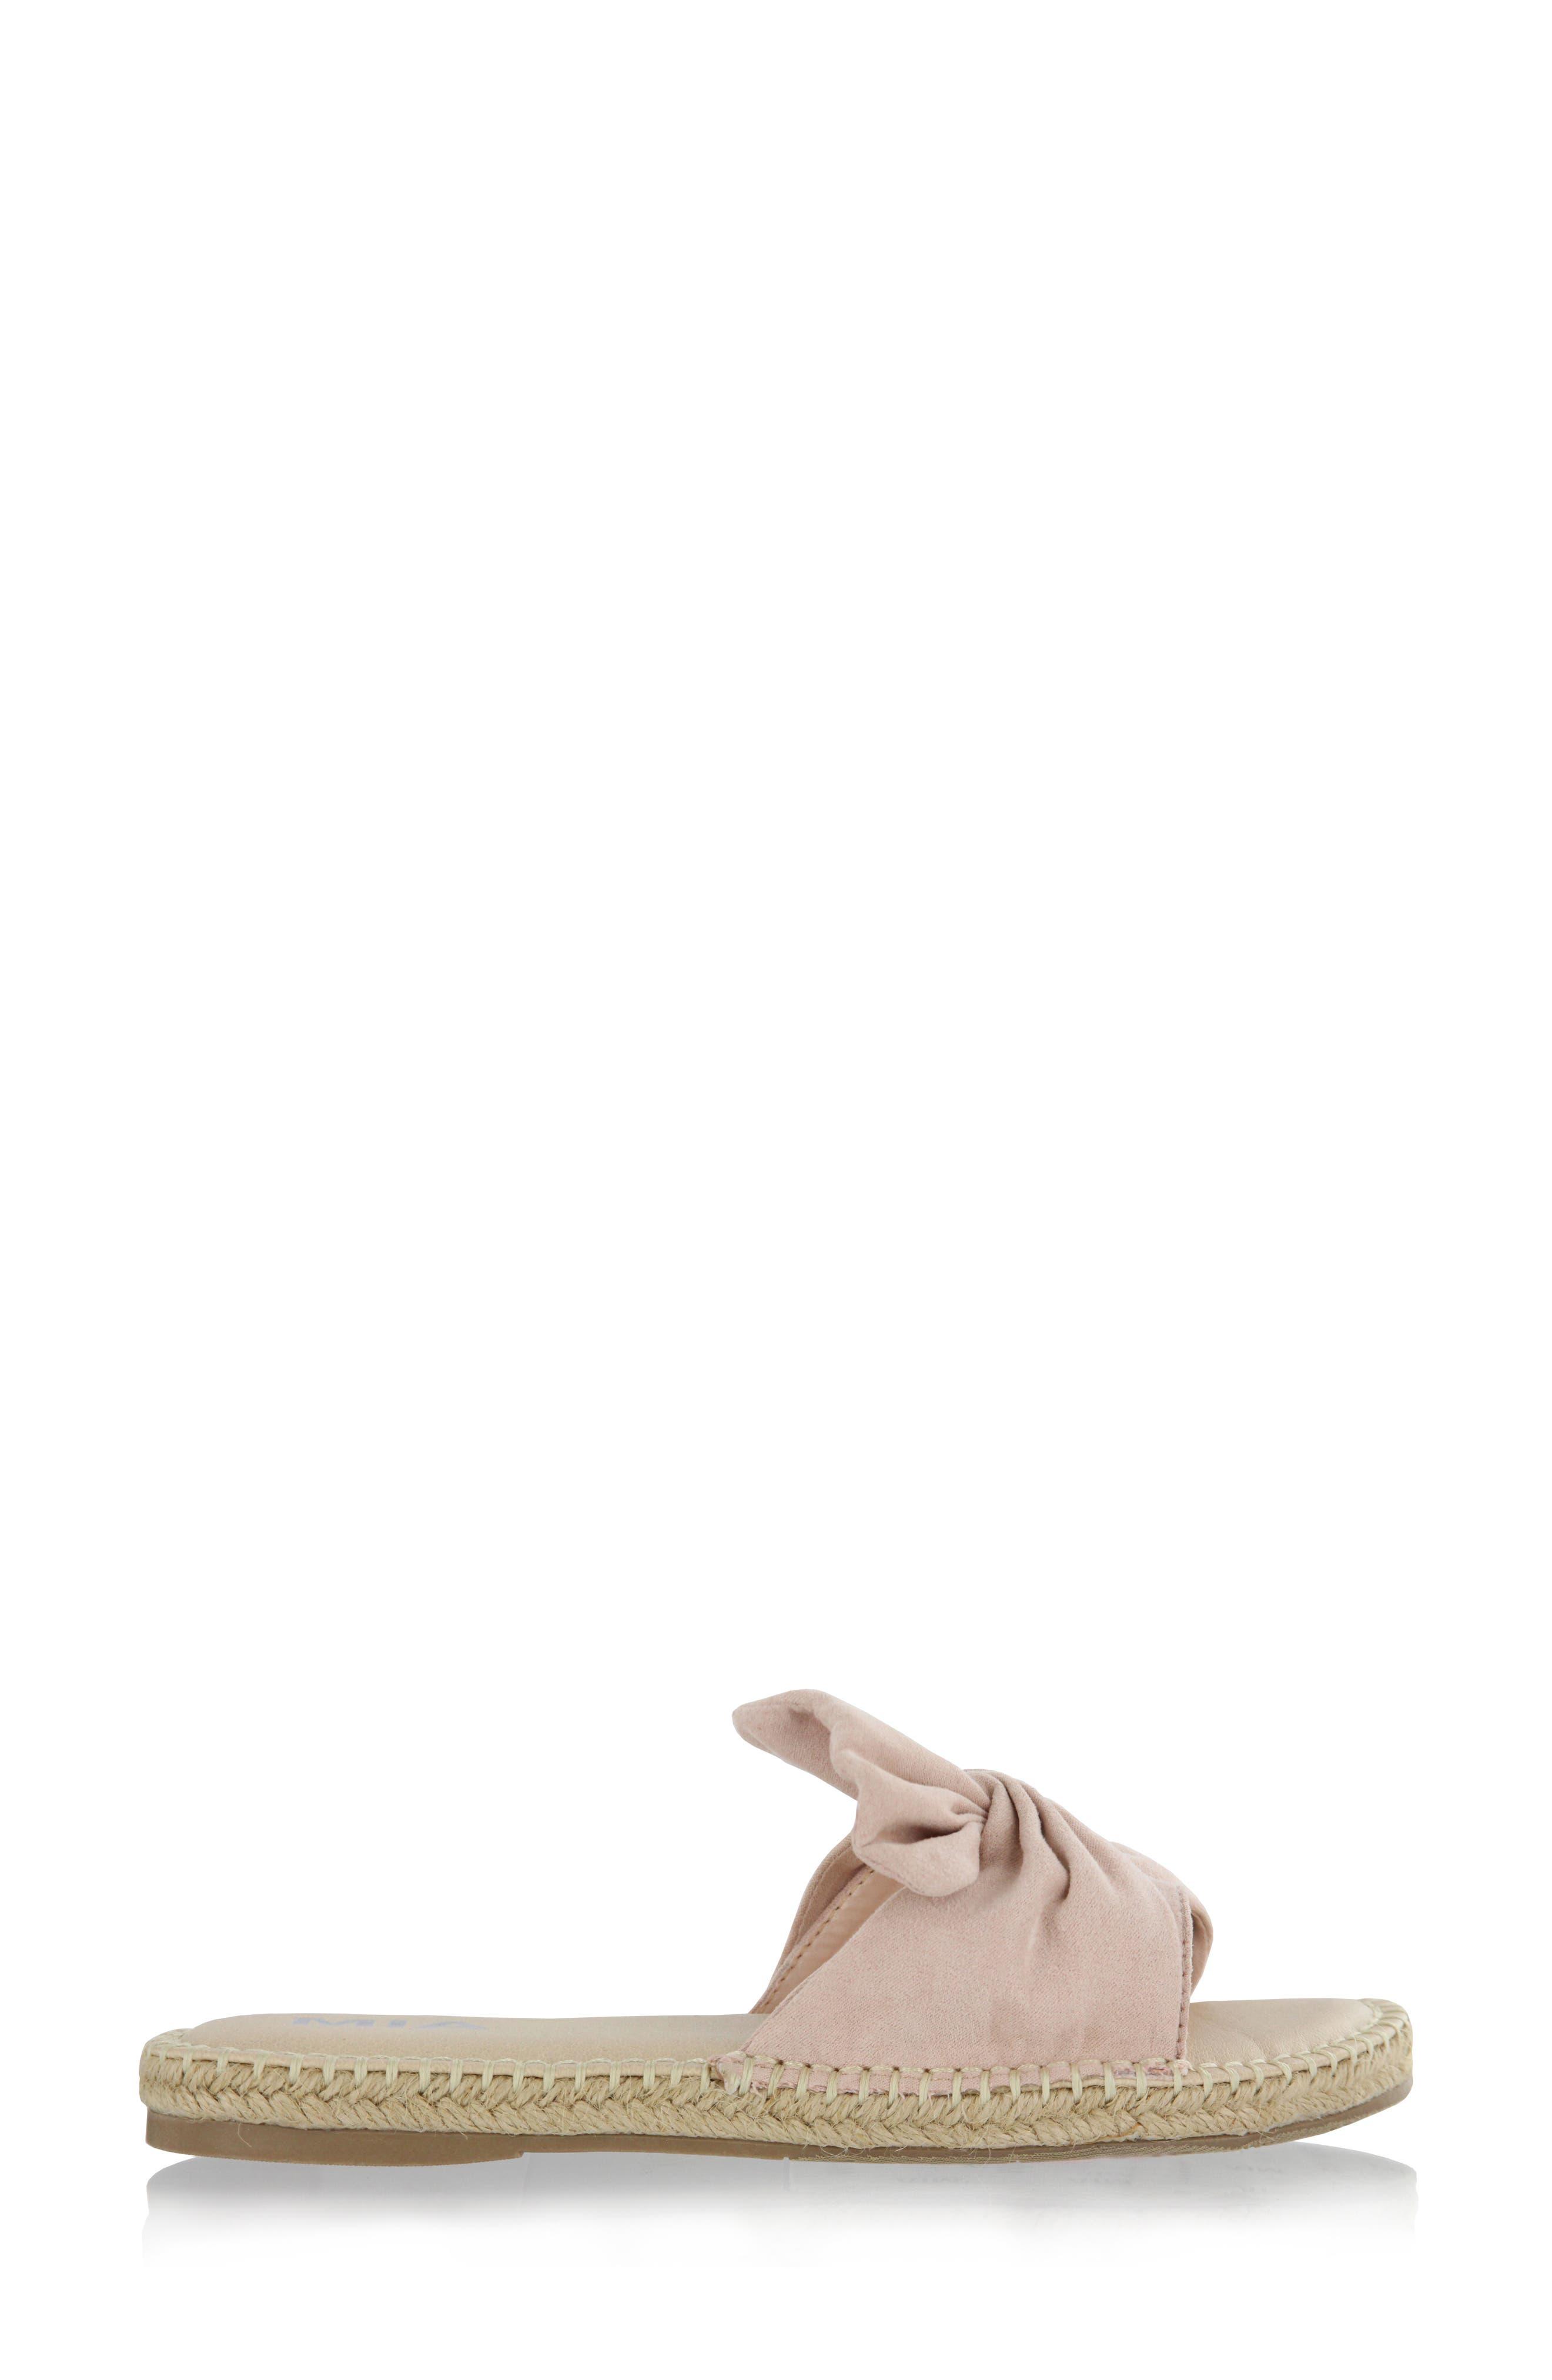 Kensi Knotted Slide Sandal,                             Alternate thumbnail 12, color,